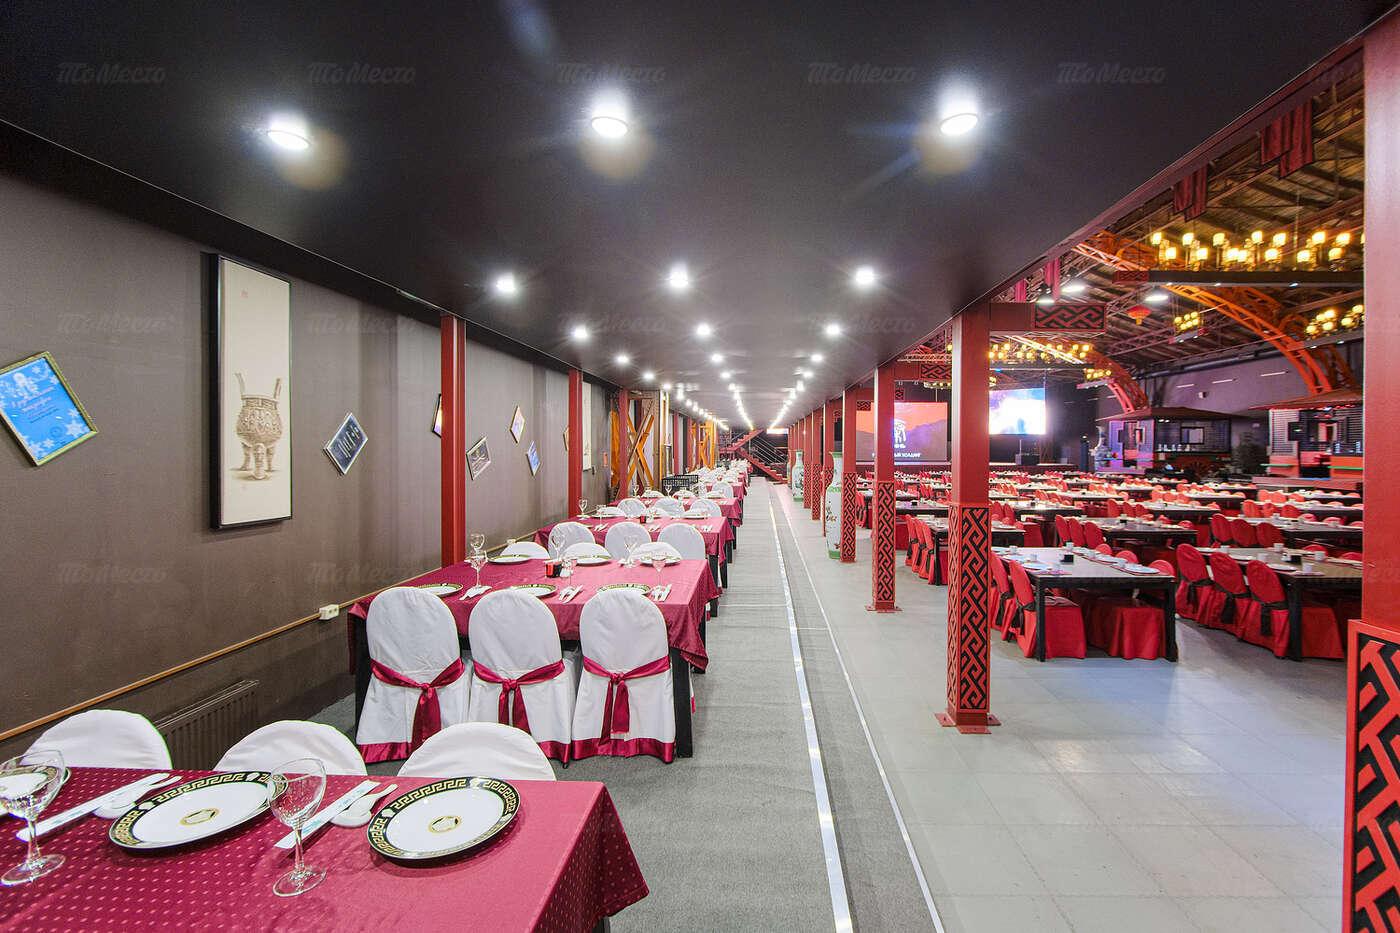 Ресторан Цинь на 16-ой линии В.О. фото 4